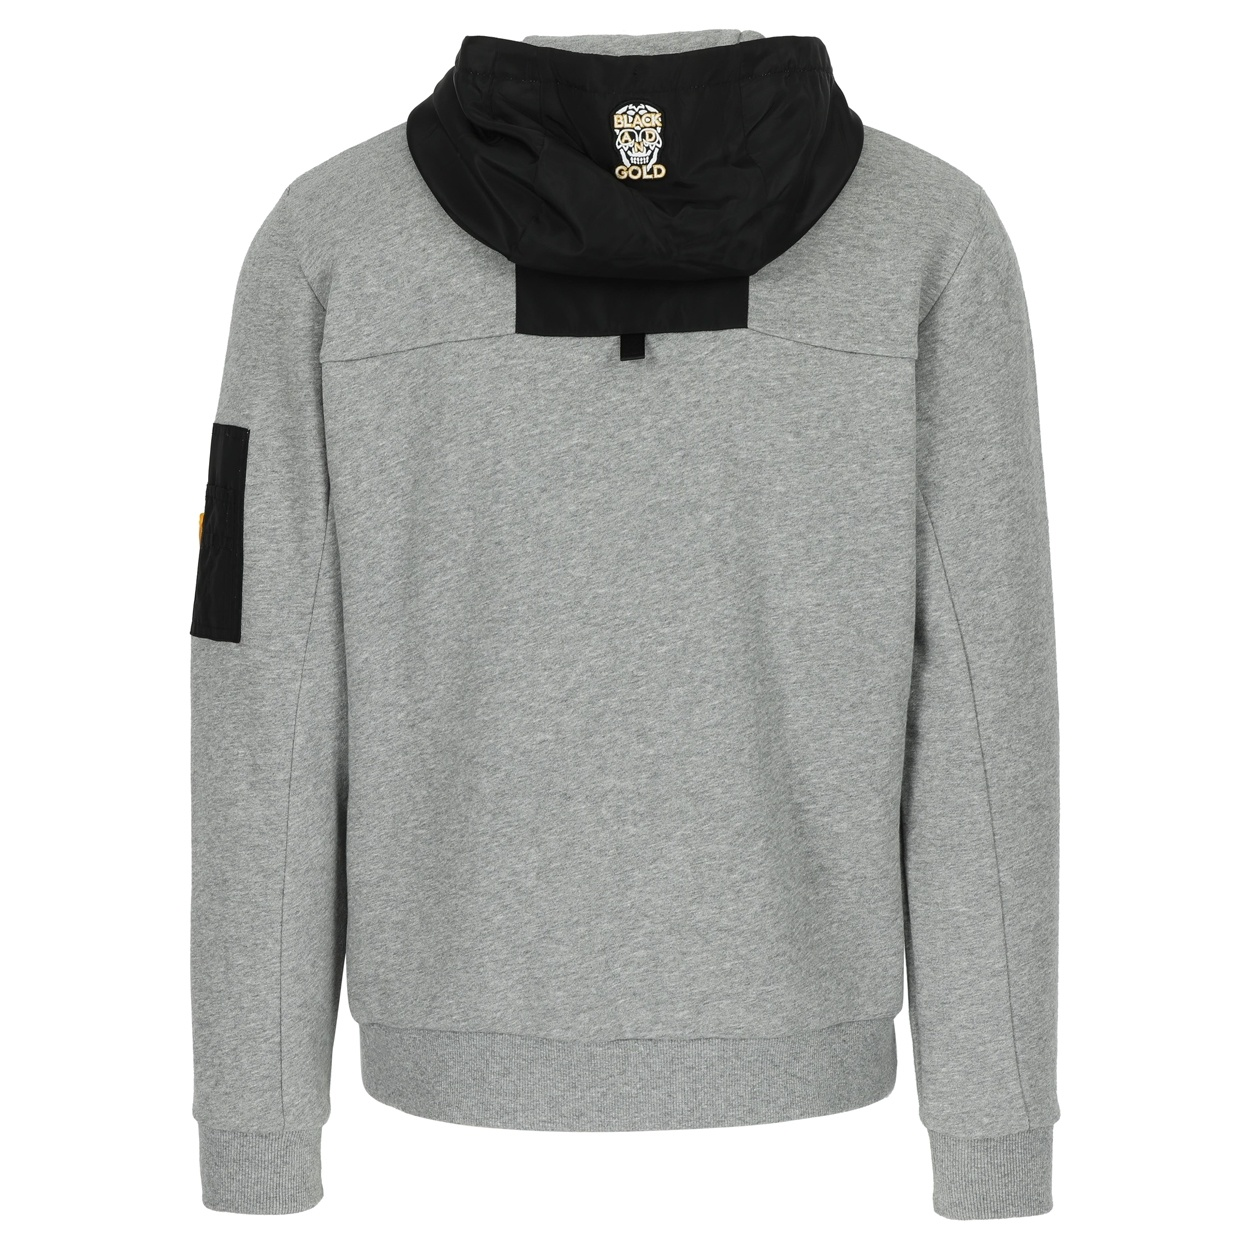 Black&Gold Satinos Grey Melange